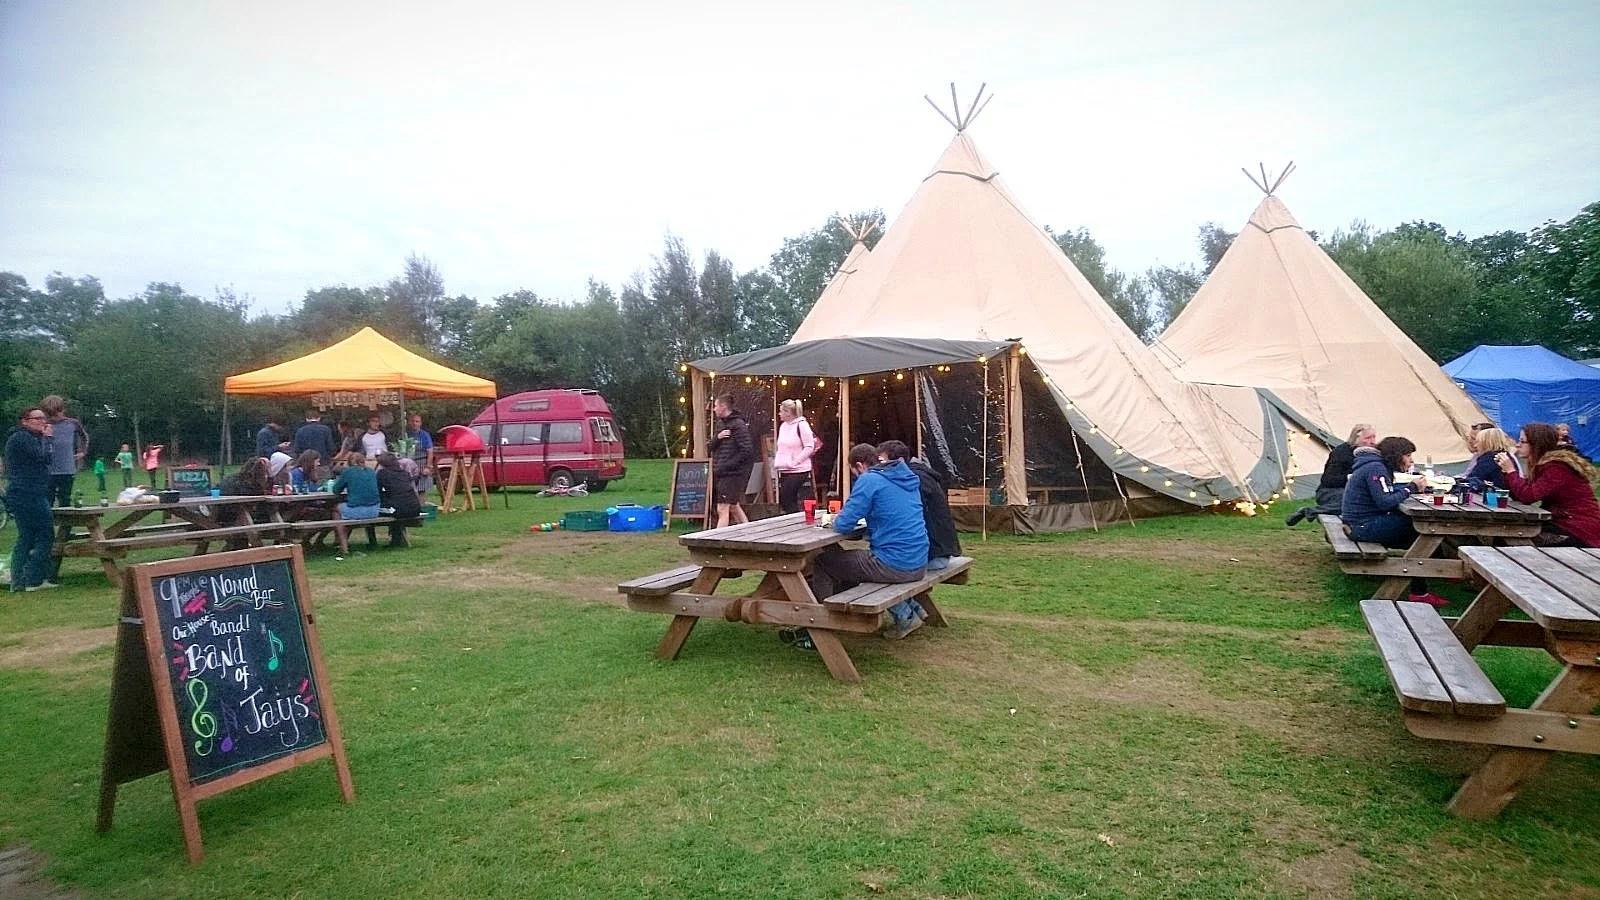 Cotswold Tipis at Edinburgh Festival Camping 2018